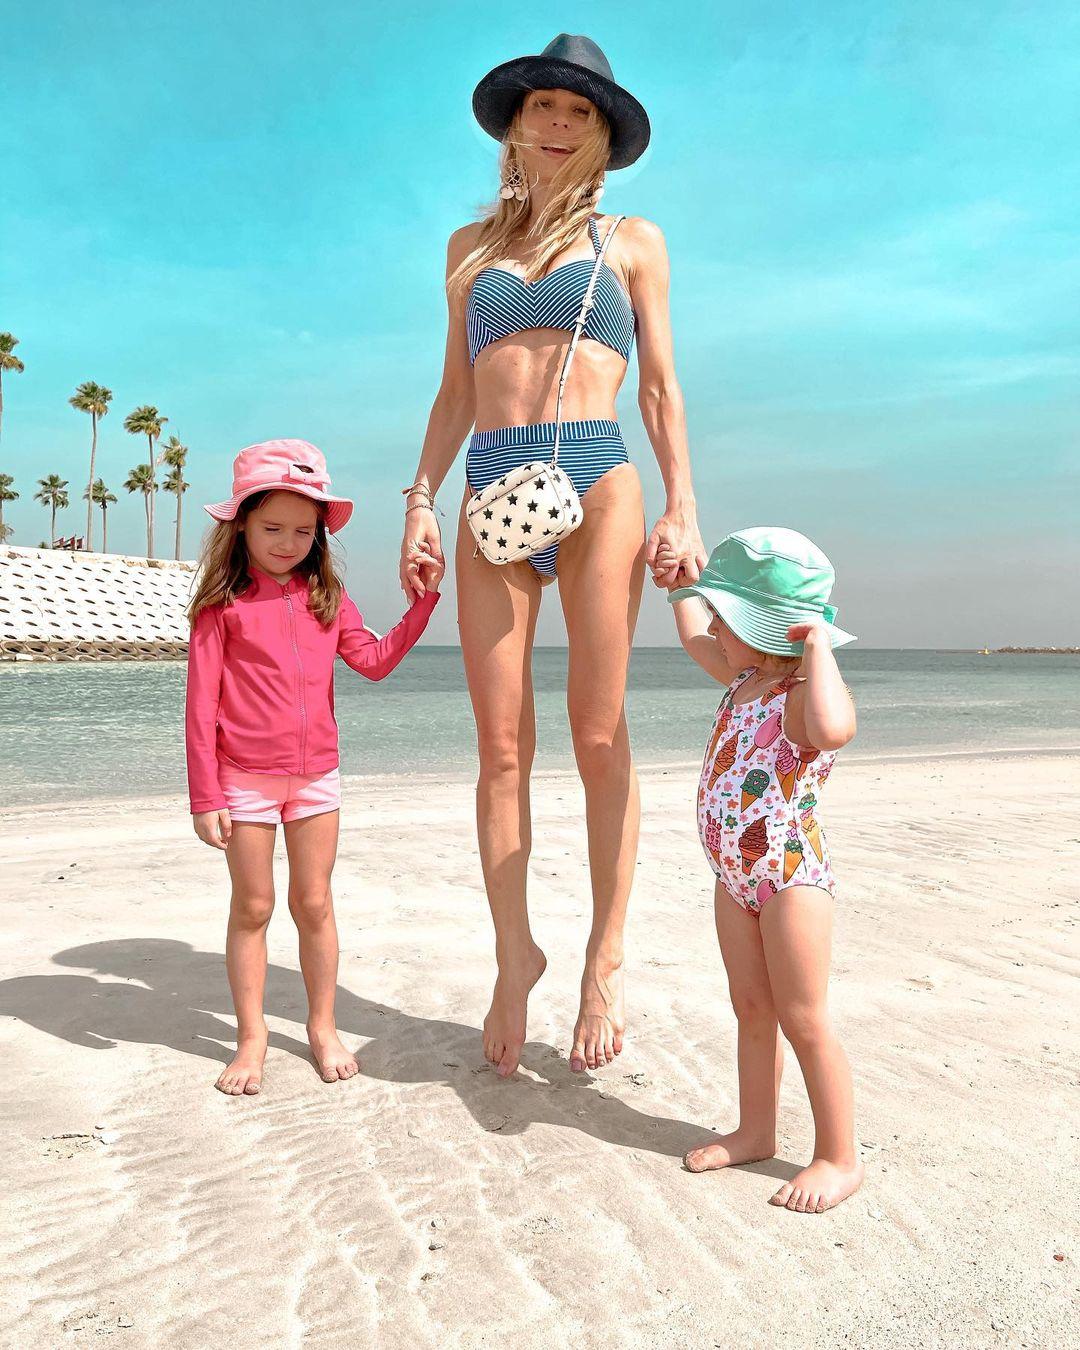 Anna Khilkevich explained why so thin